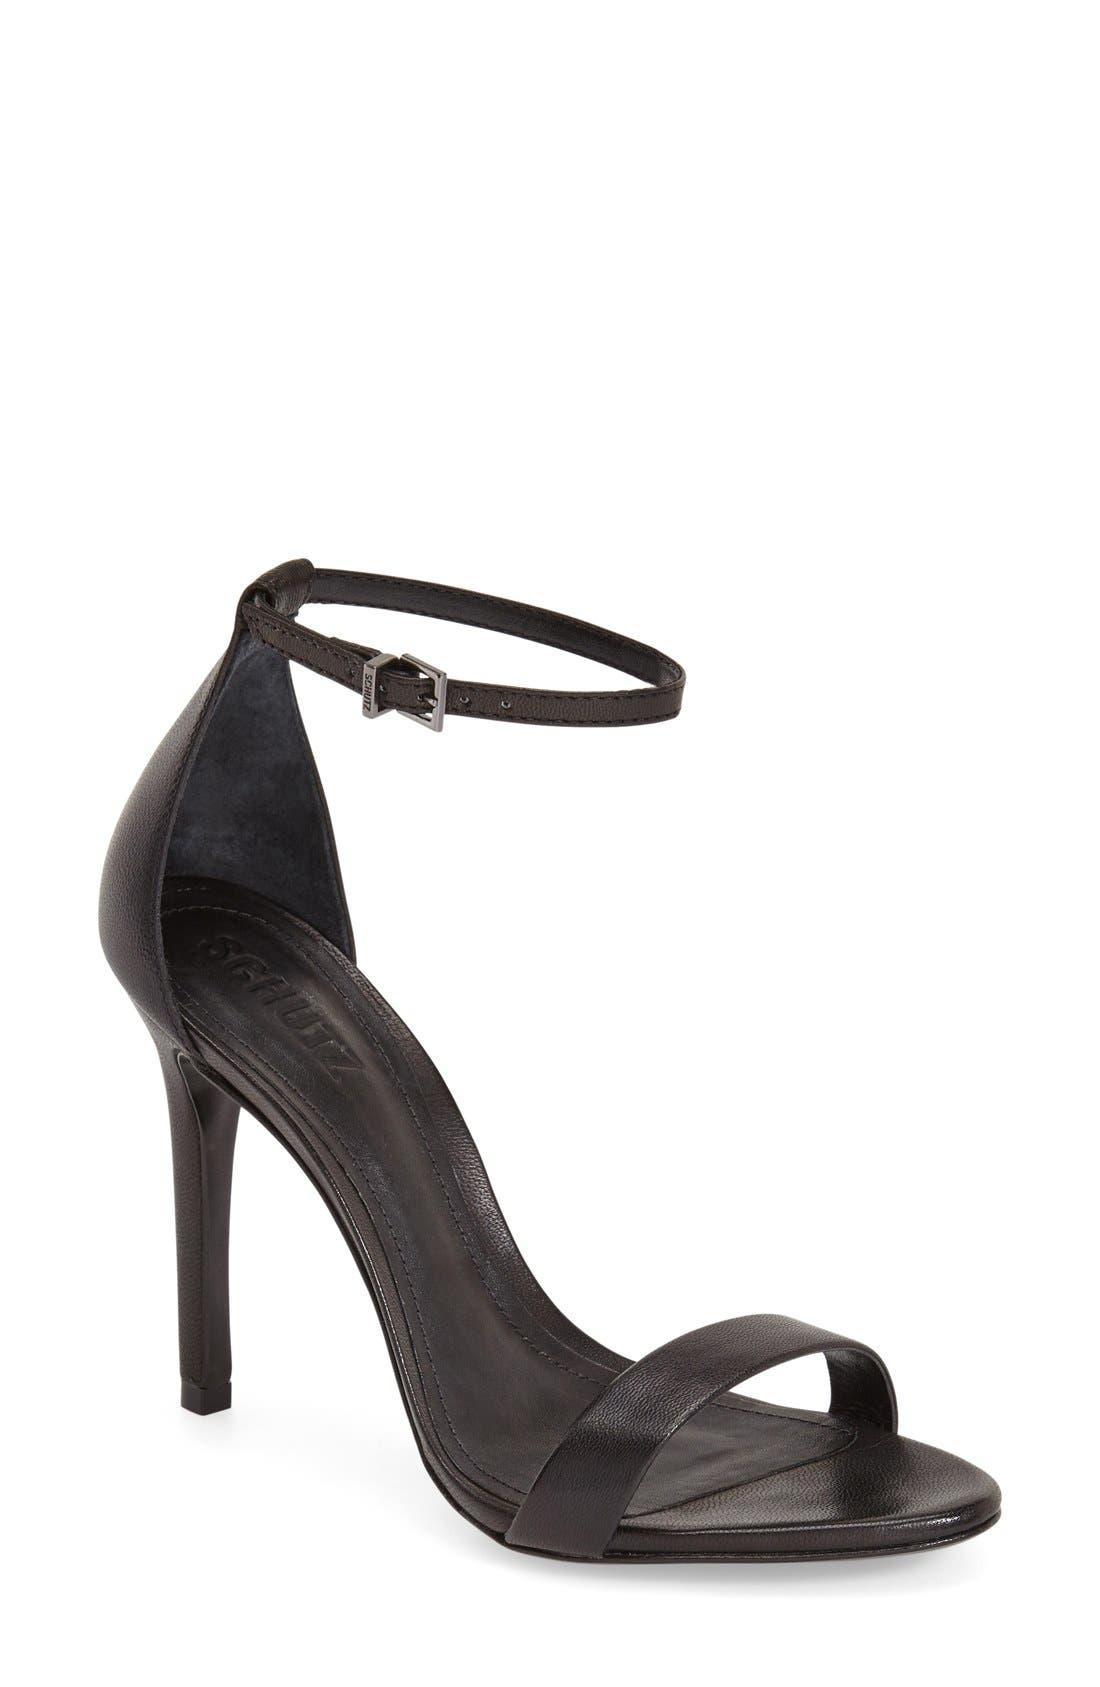 Main Image - Schutz 'Cadey Lee' Sandal (Women)